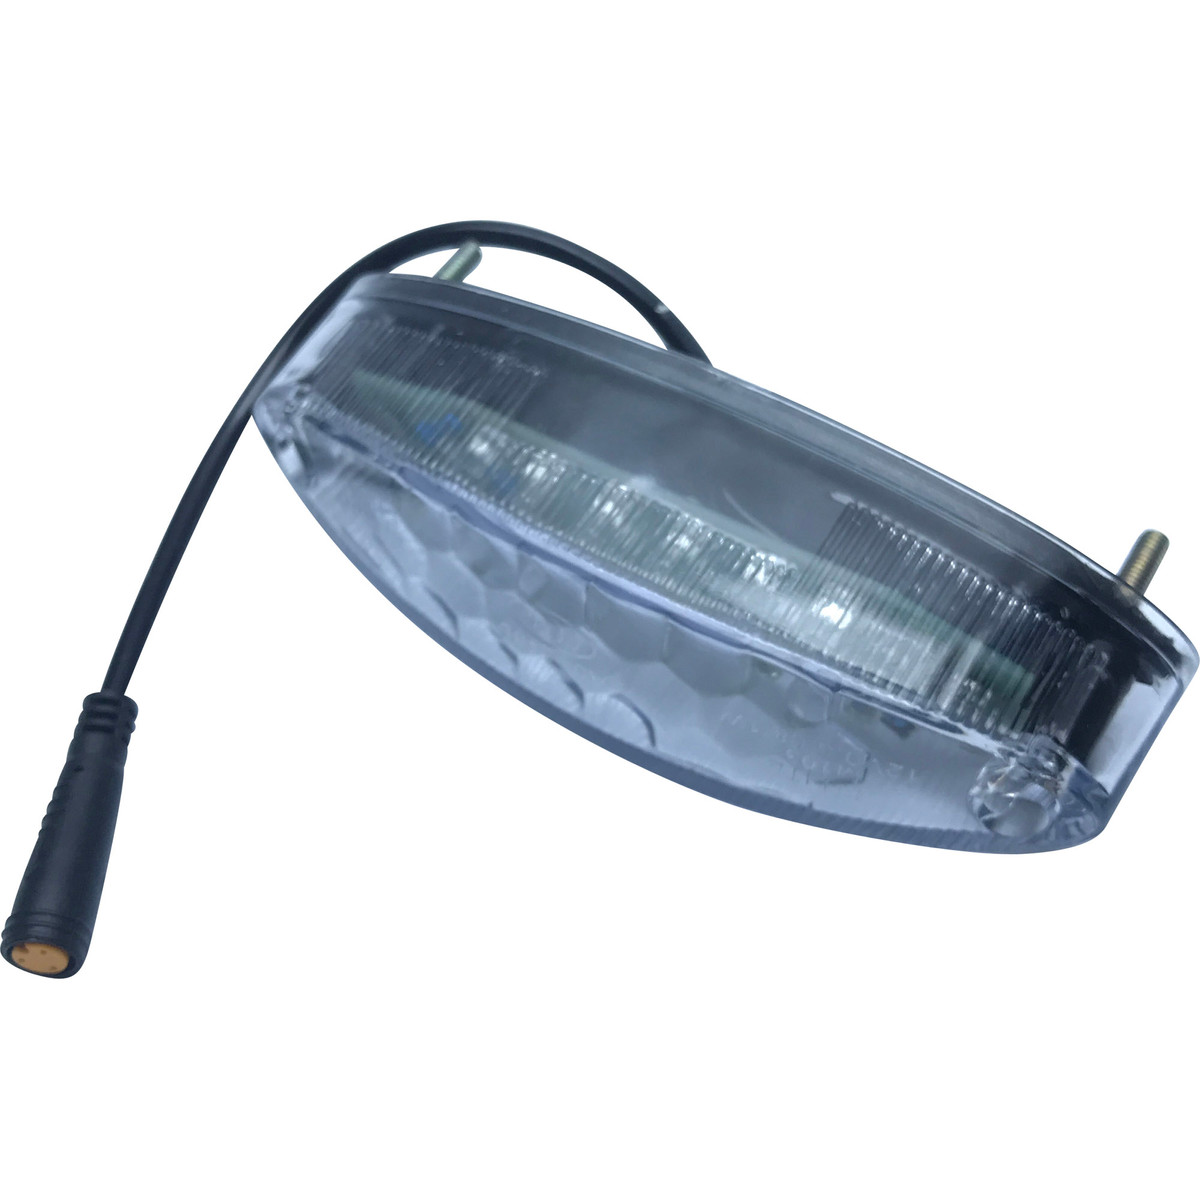 FORÇA Rück-/Bremslicht LED für CitySpeedster